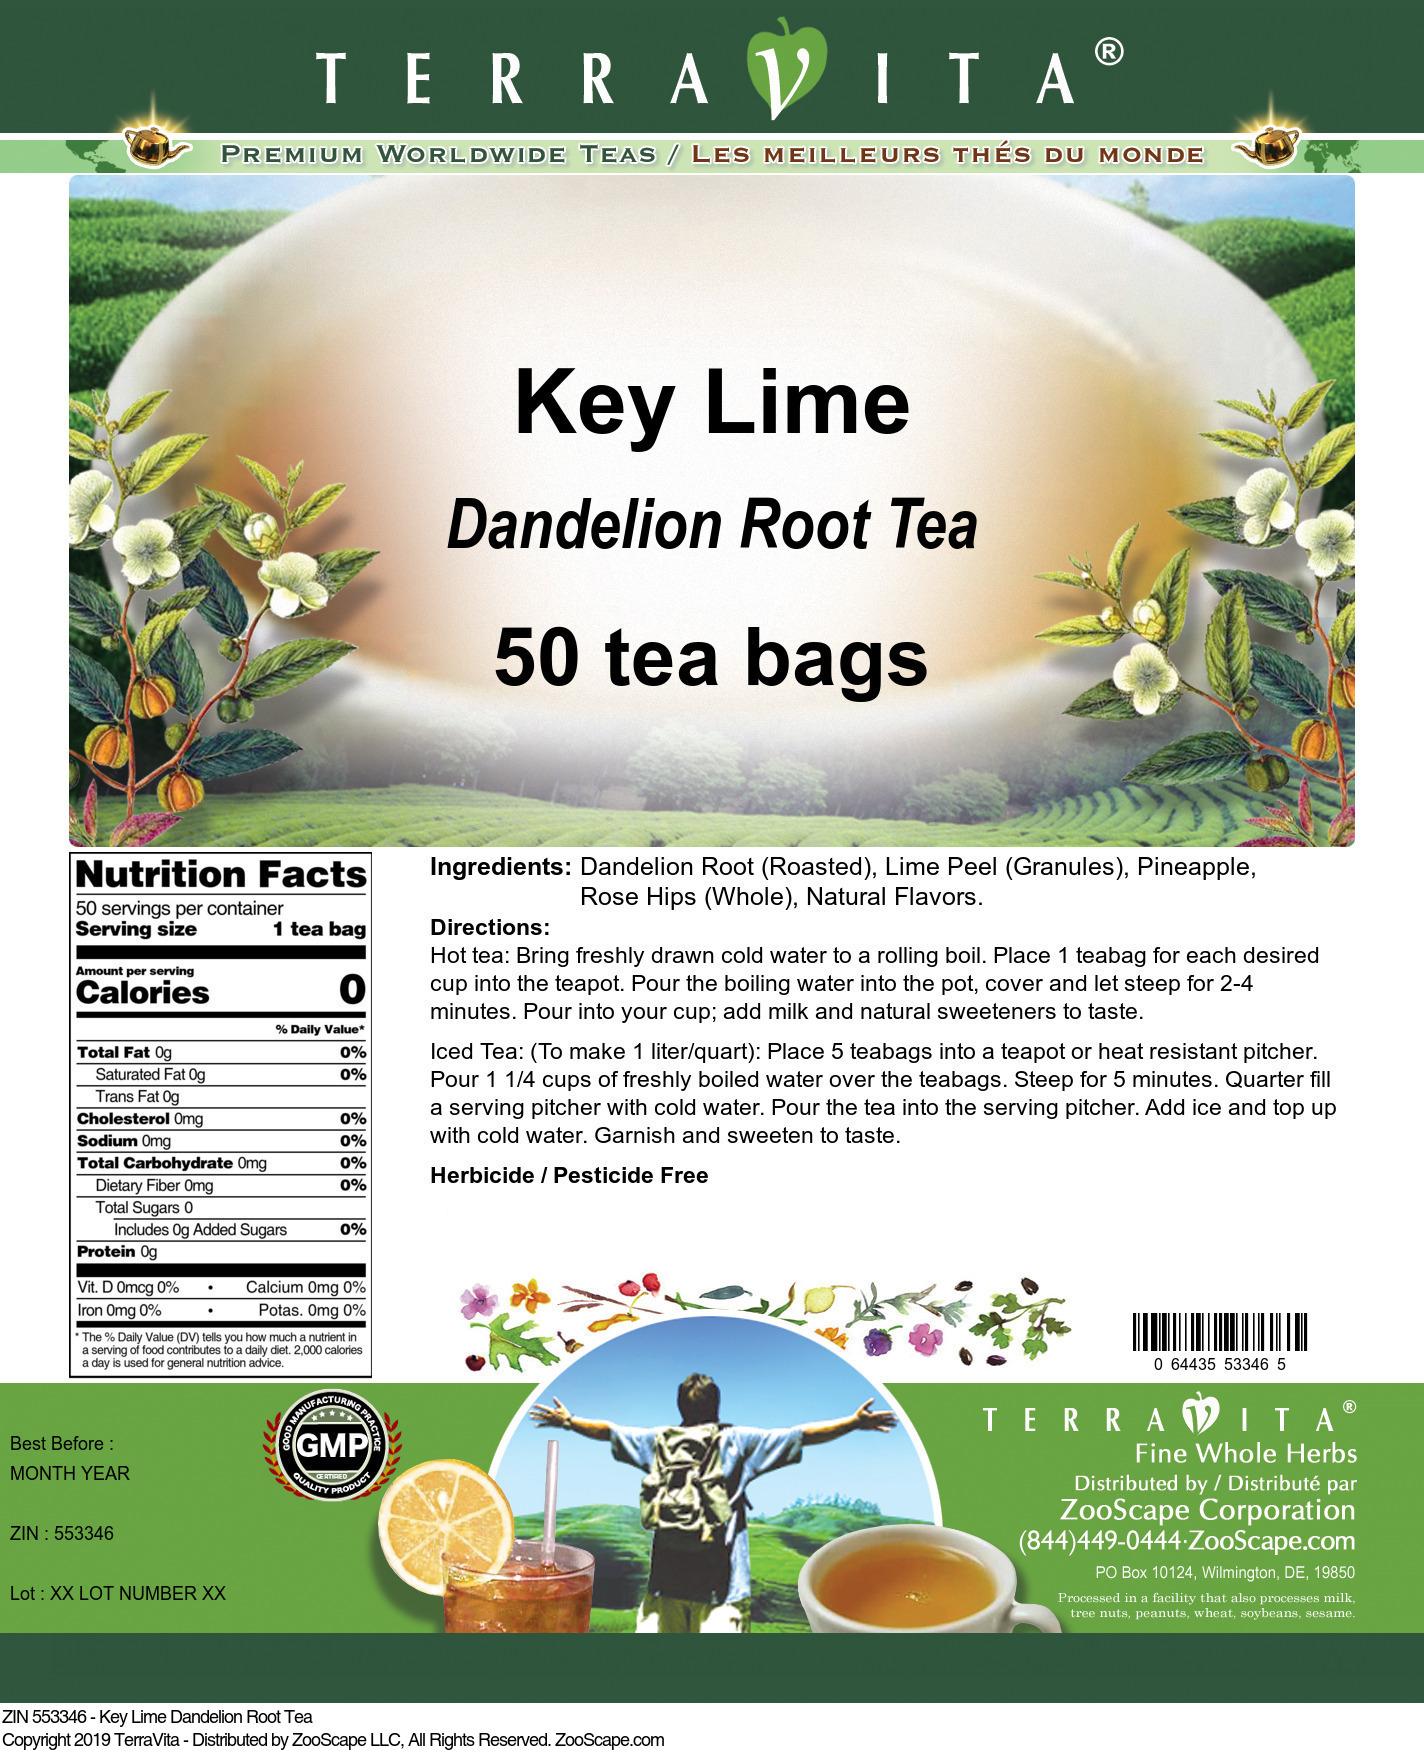 Key Lime Dandelion Root Tea